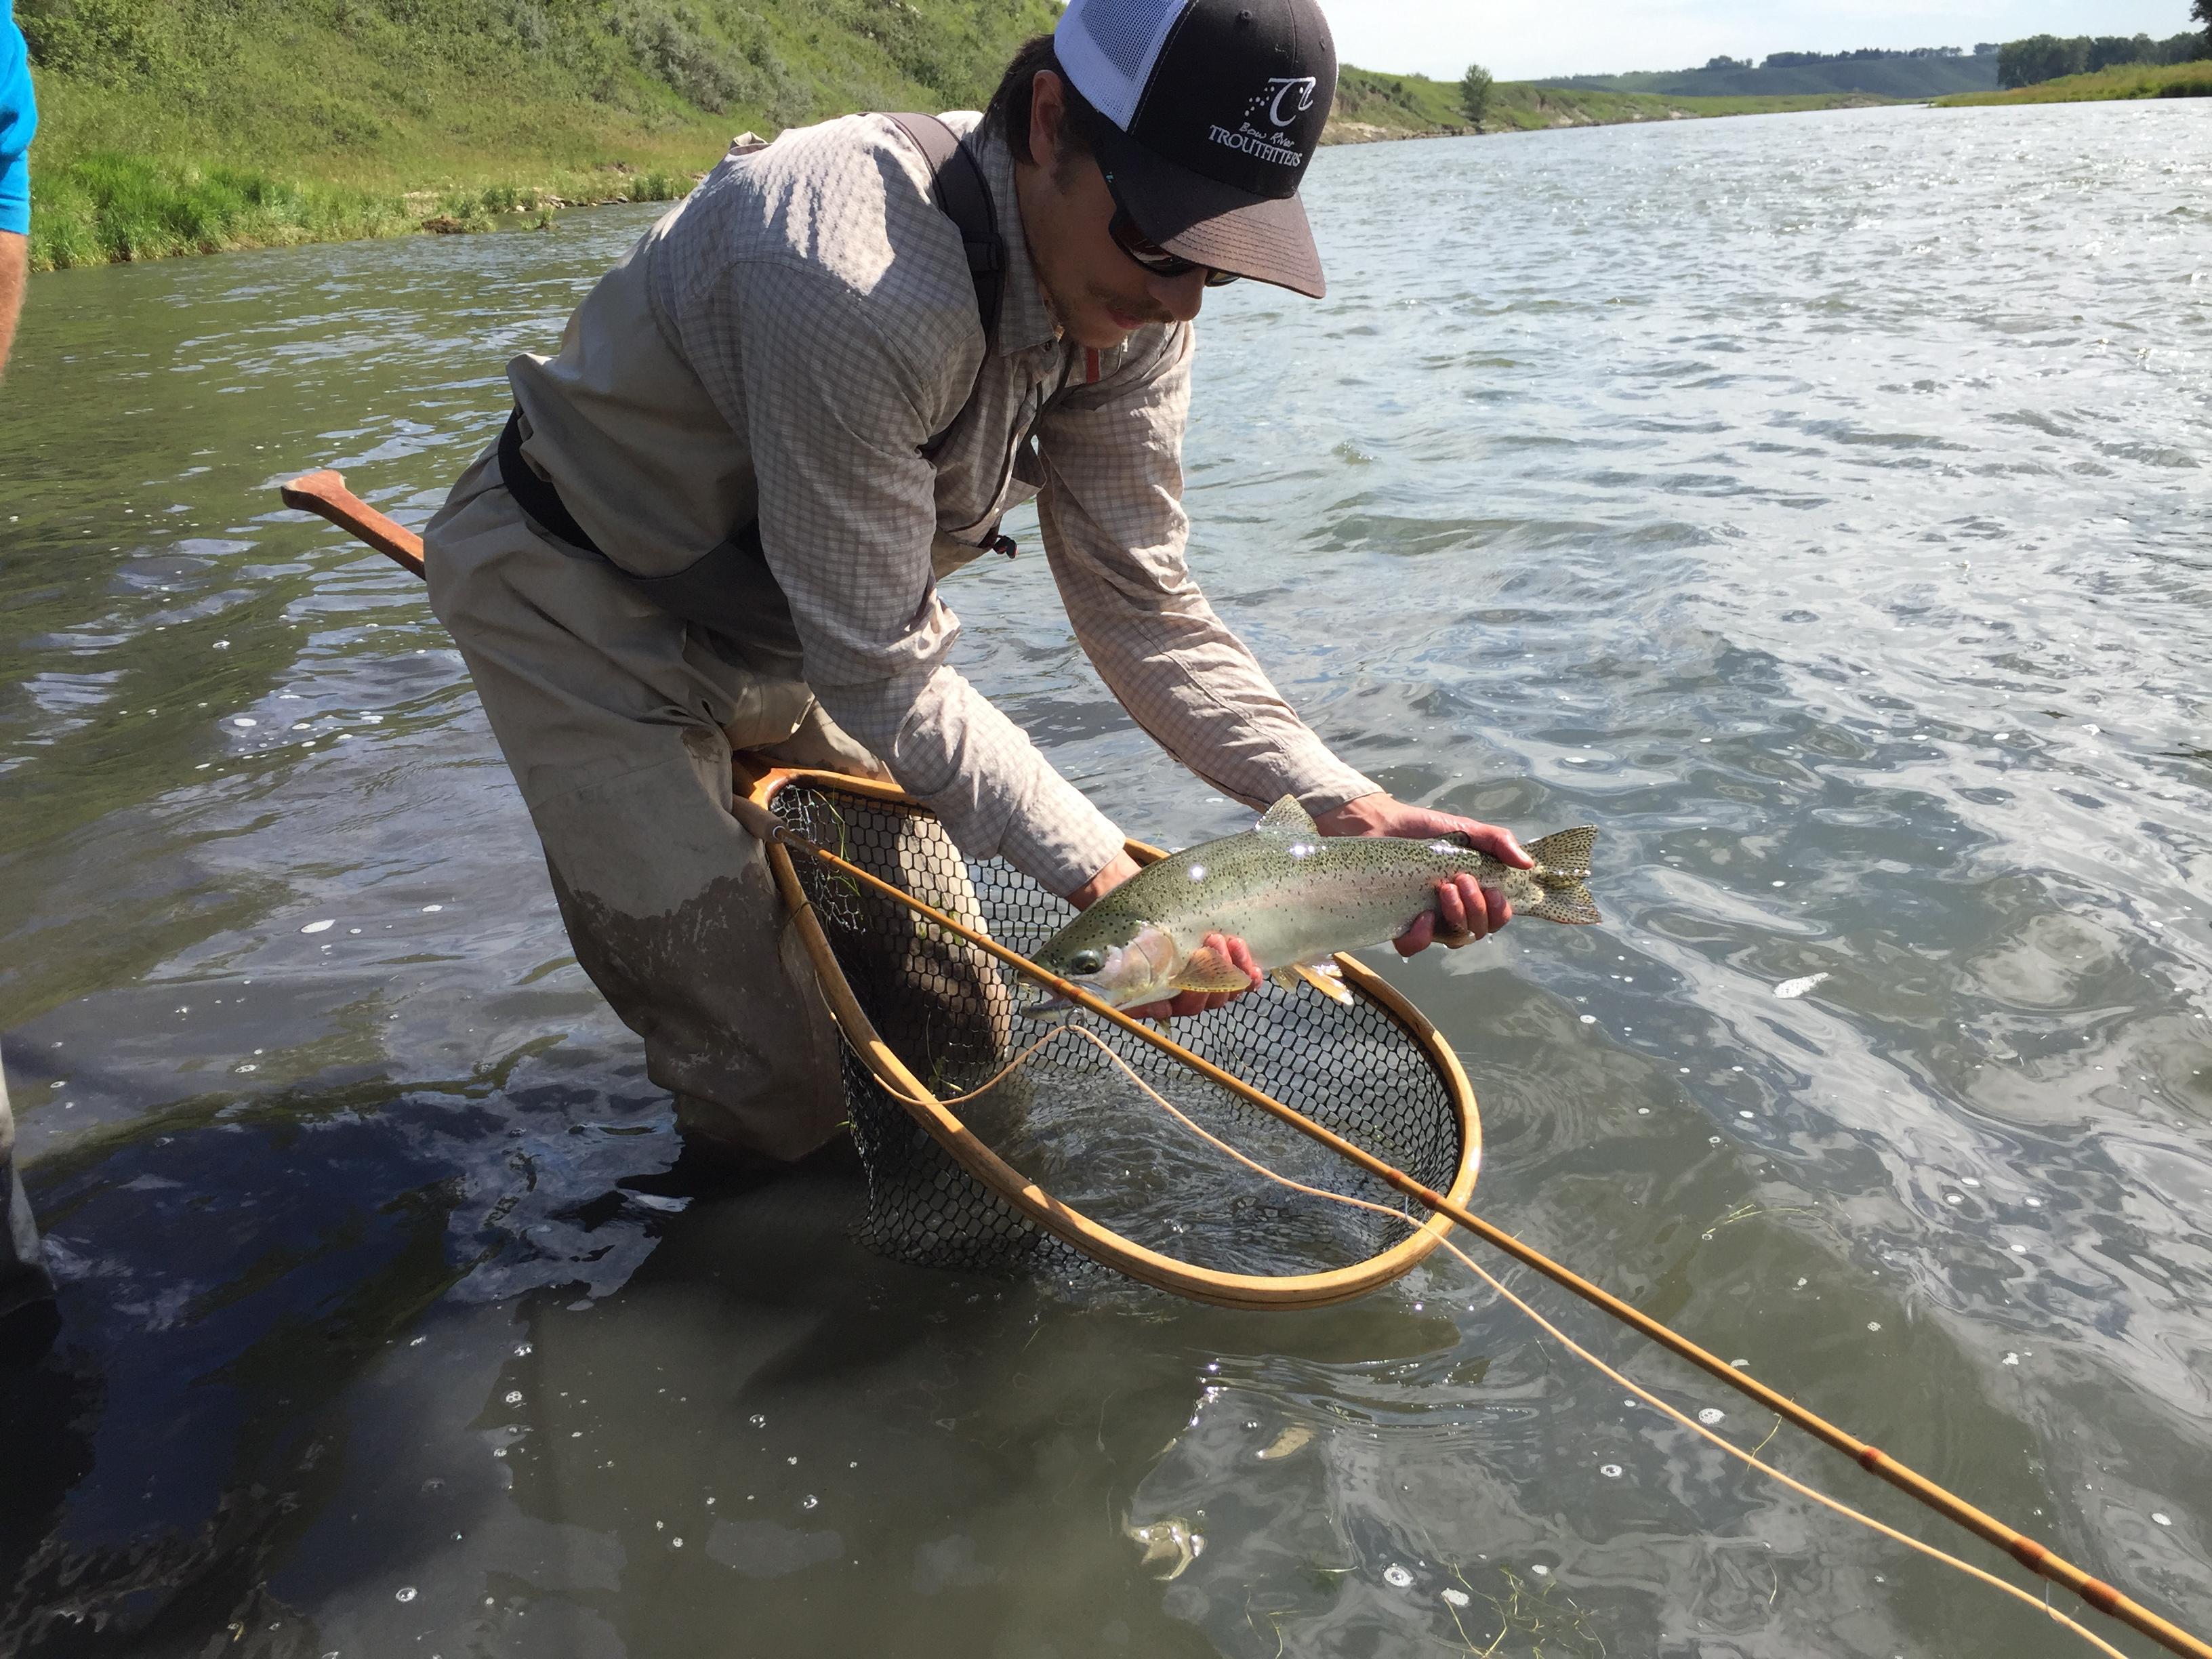 loop evotec cast rainbow trout